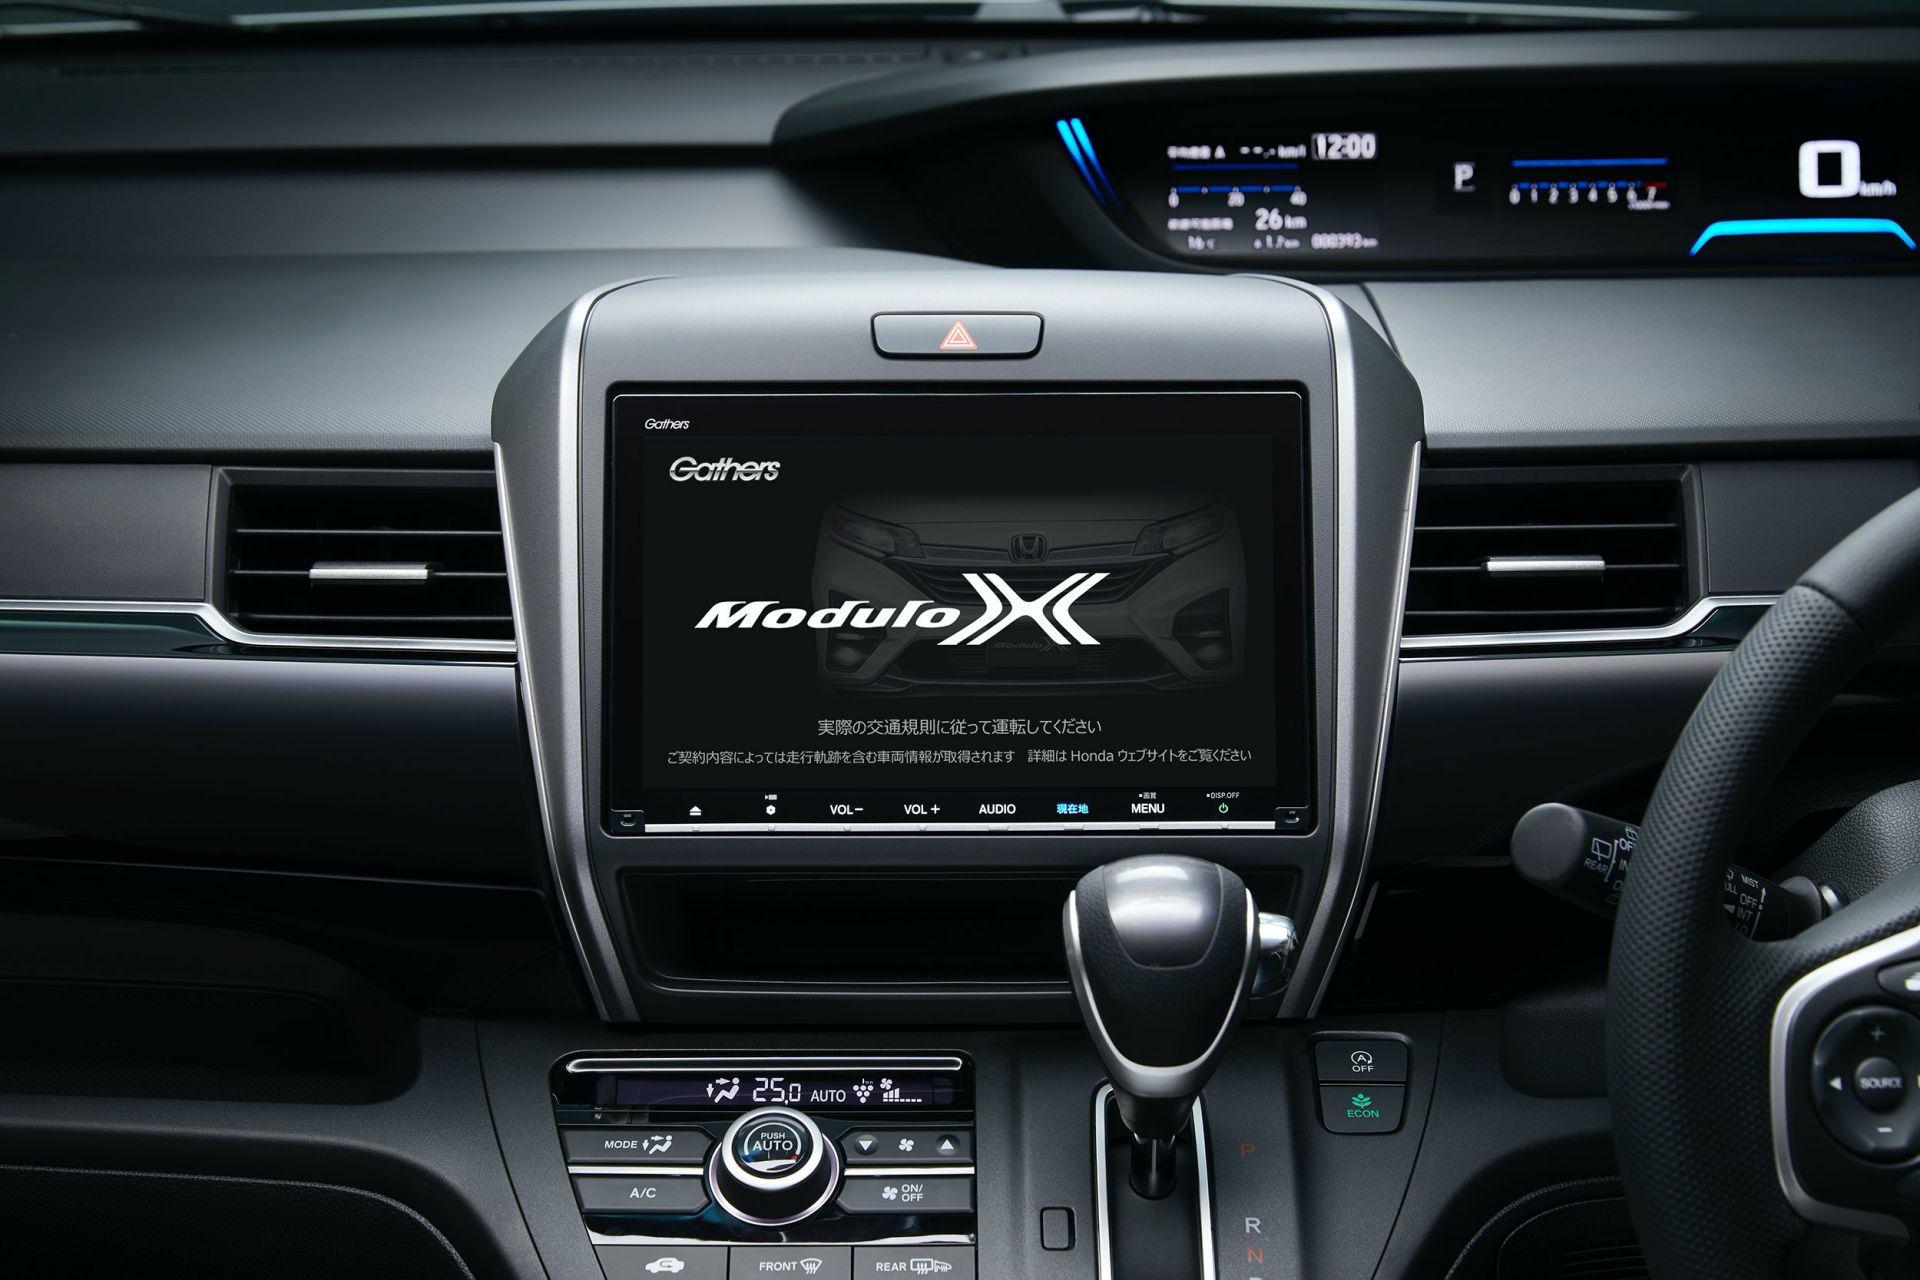 Honda-Freed-Modulo-X-Facelift-2020-44